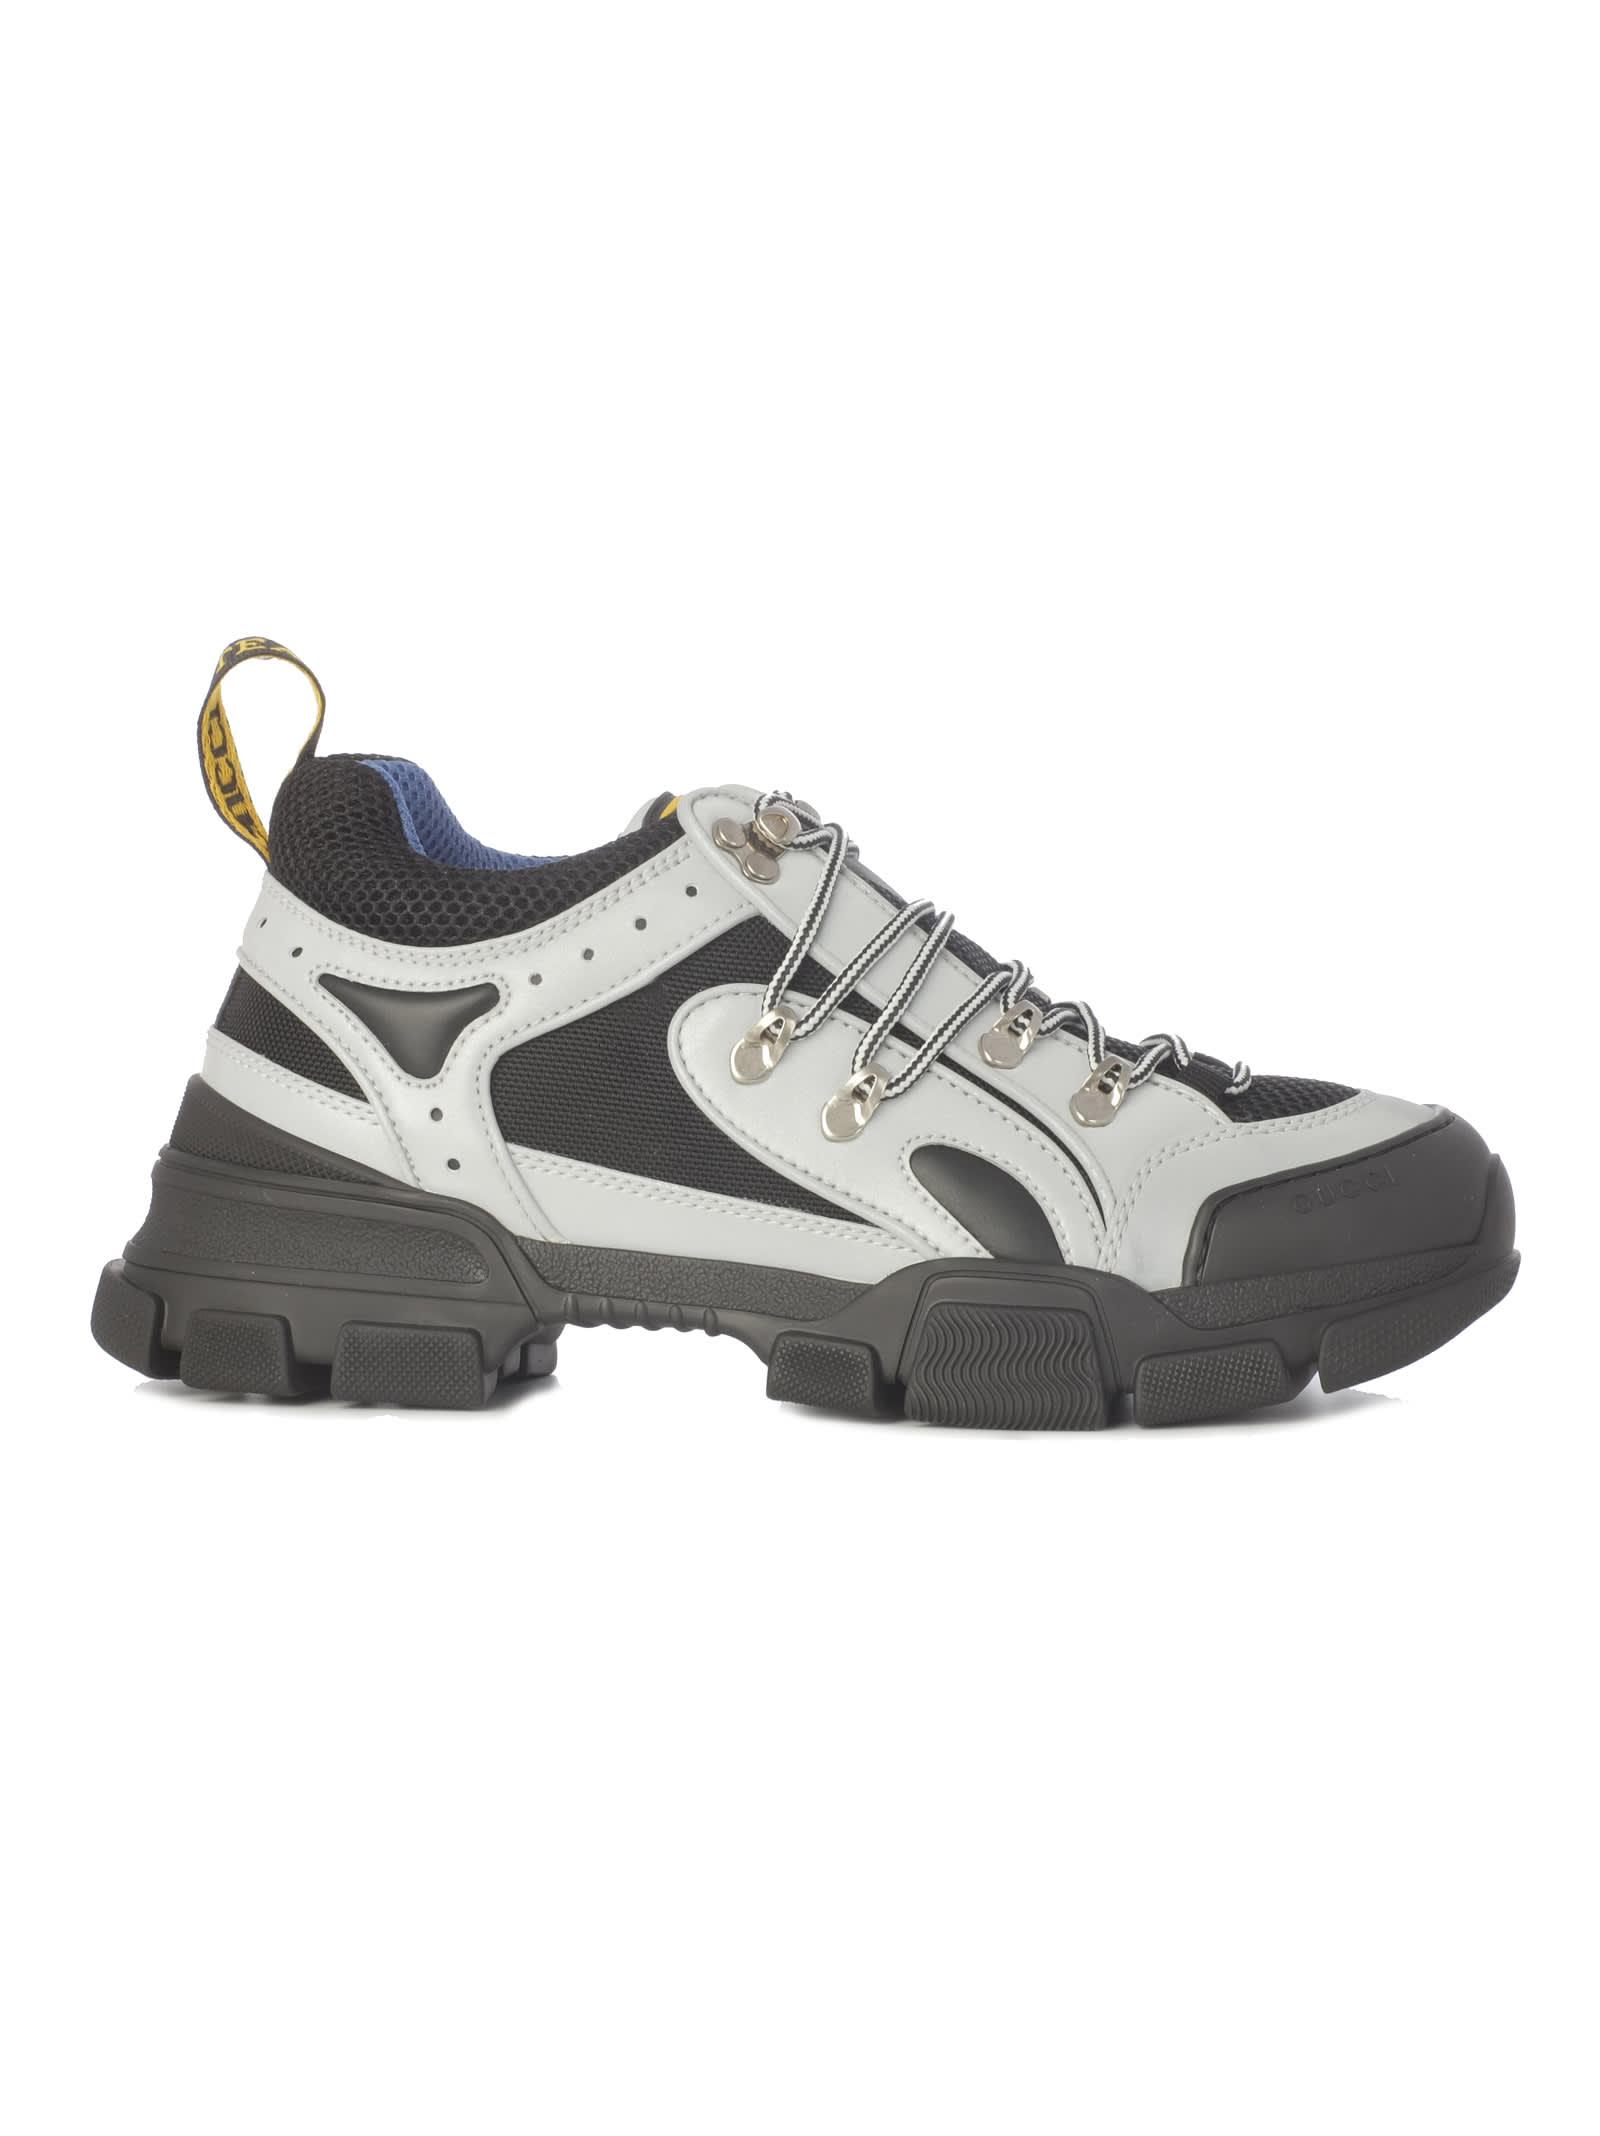 7134480f4 Gucci Gucci Flashtrek Hiking Sneakers - Silver Black - 10785198 ...